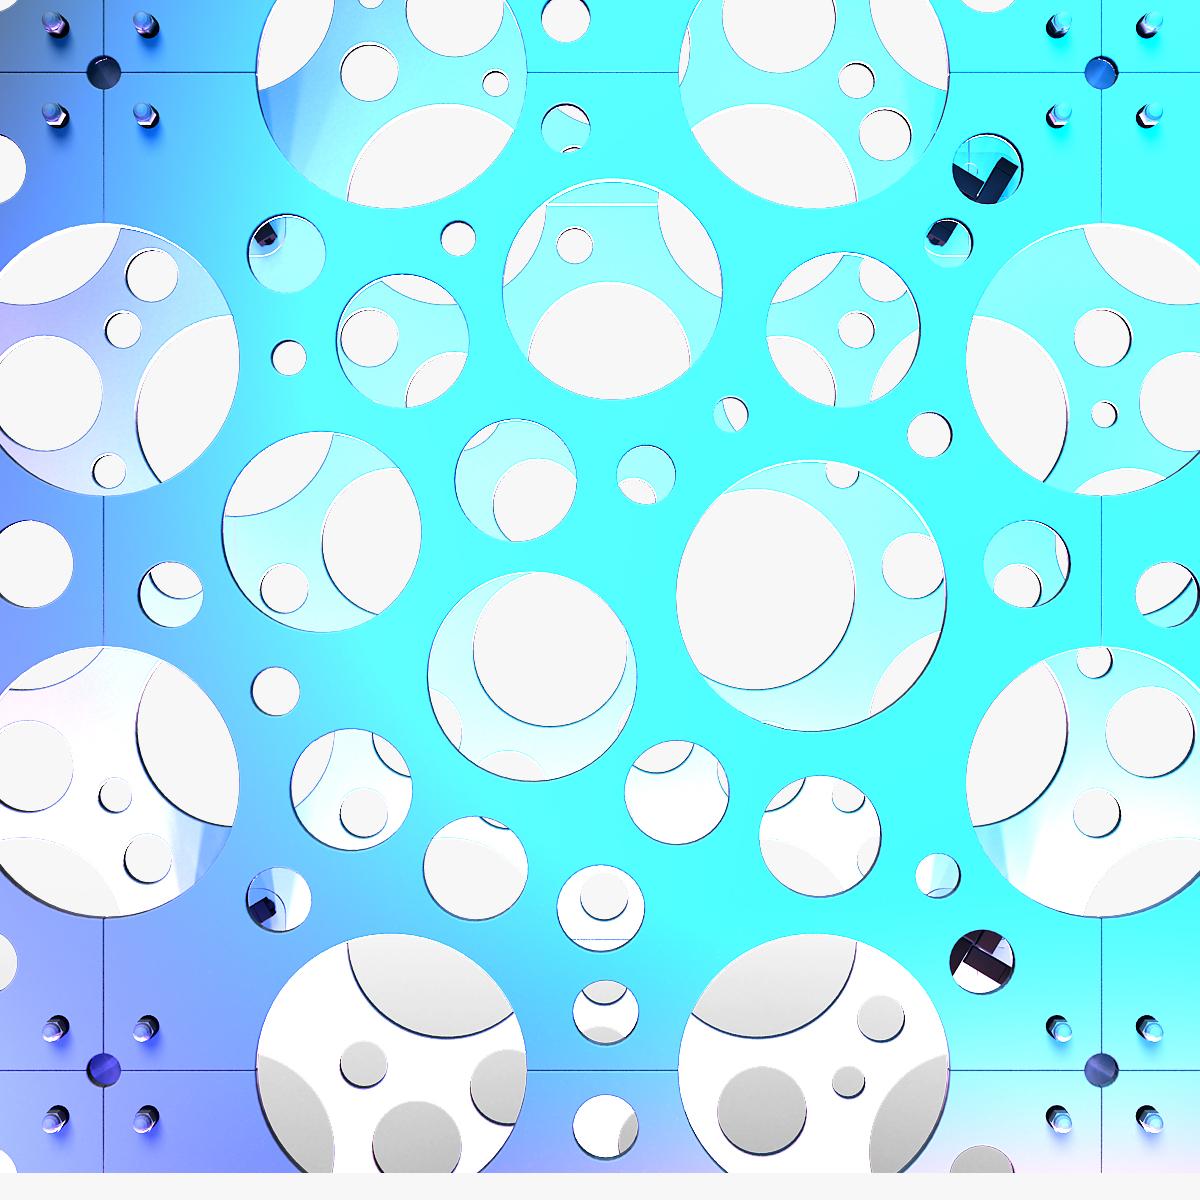 70-02-07-1200x1200.jpg Download STL file Stage Decor Collection 01 (Modular 9 Pieces) • 3D printer model, akerStudio